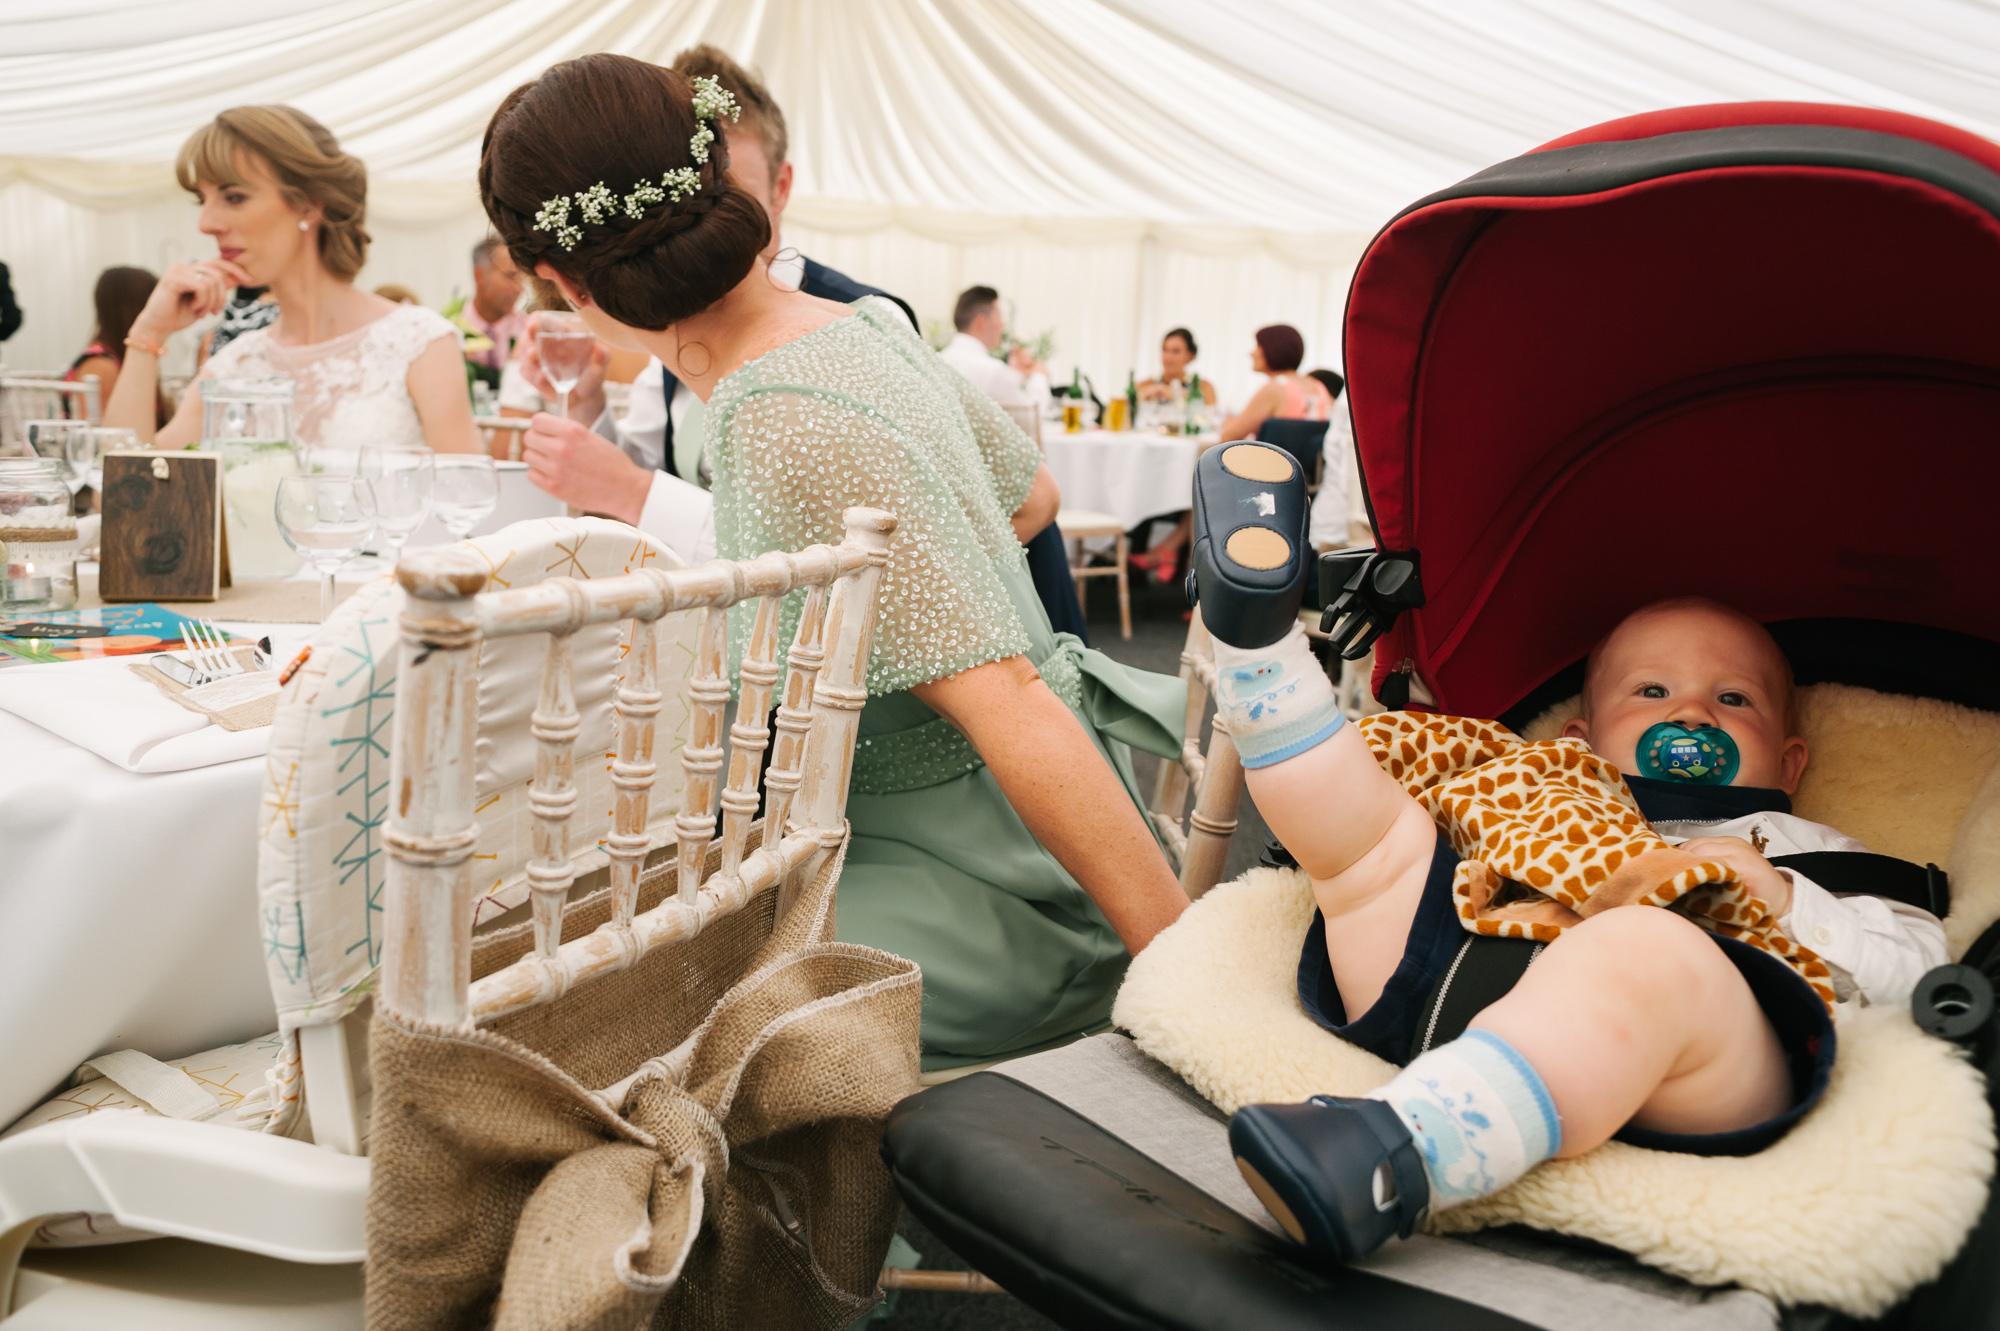 Cricket Club Wedding Tea Party Eversholt Bedfordshire-49